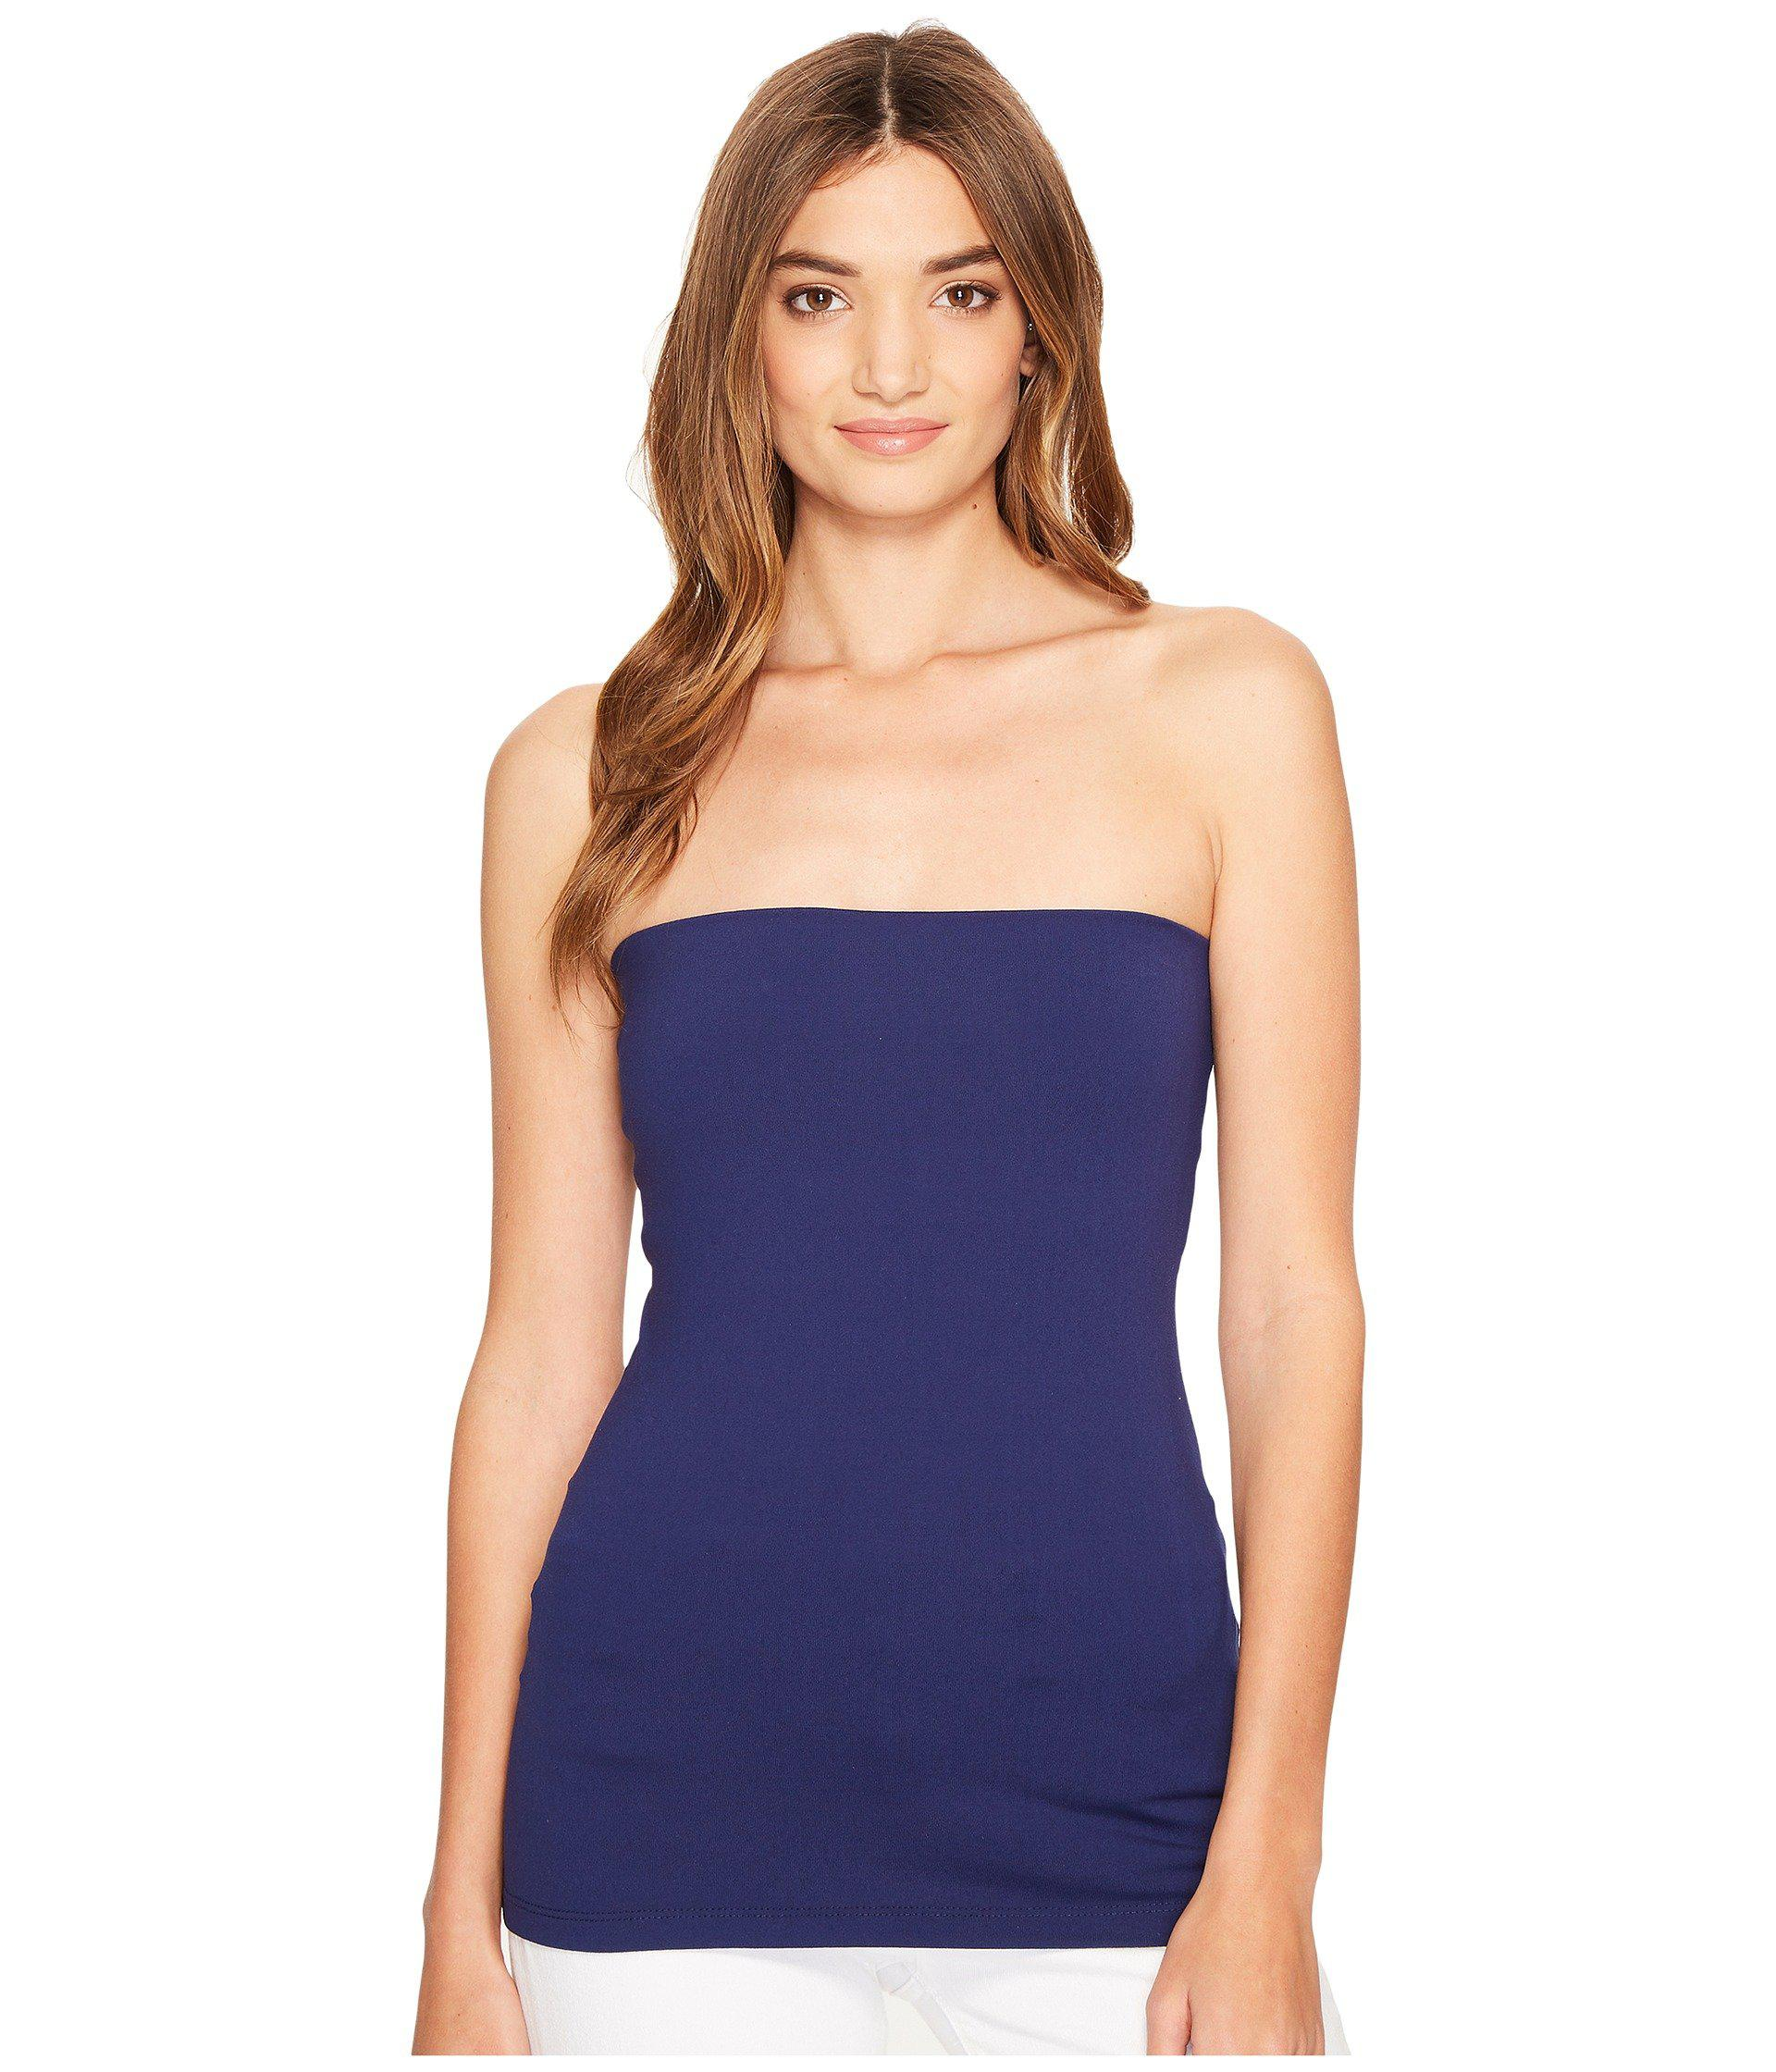 b145cfe808e441 Susana Monaco Tube Top (black 1) Women's Sleeveless in Blue - Lyst